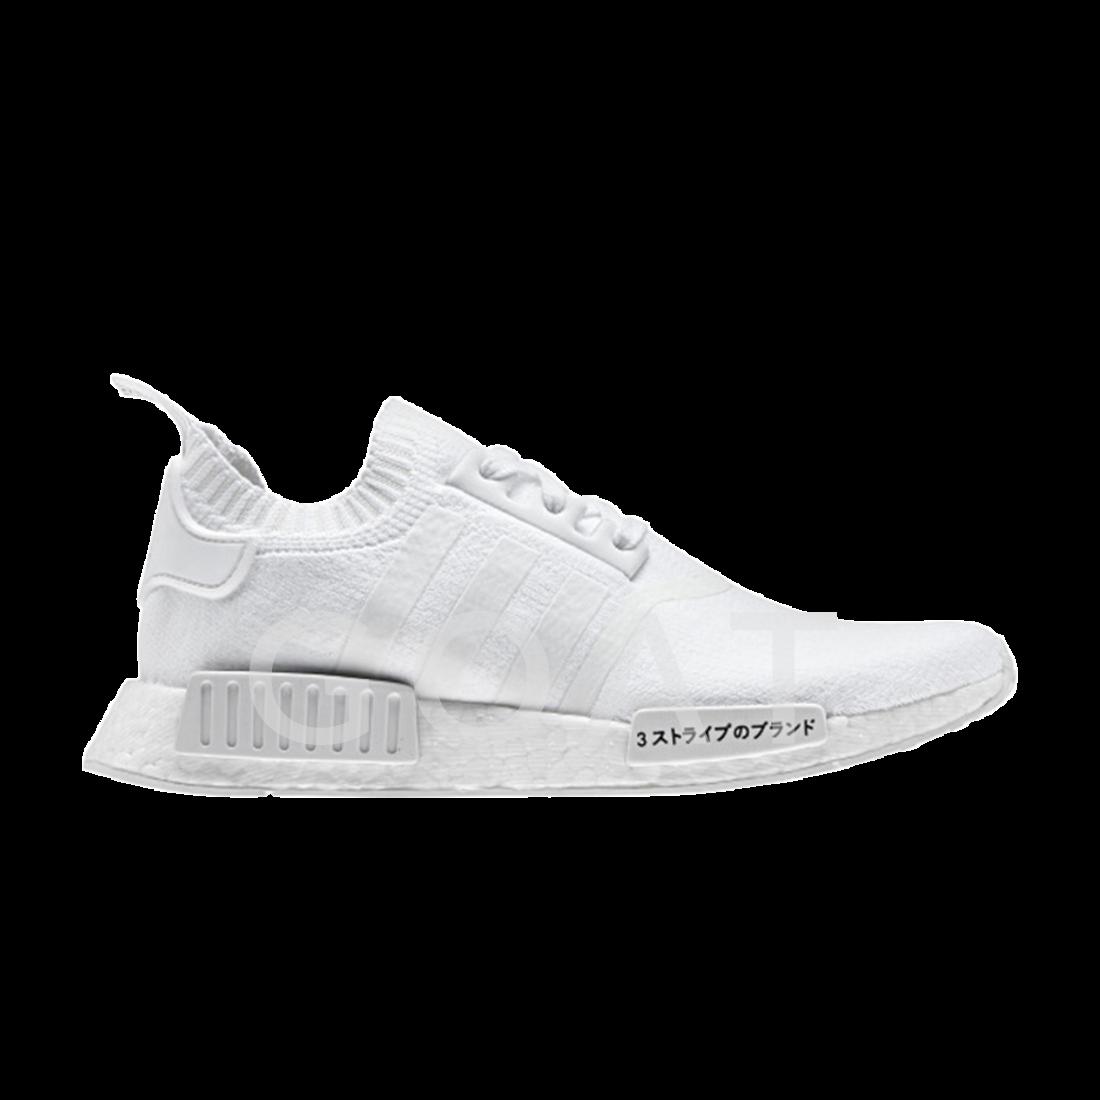 NMD_R1 Primeknit 'Japan Triple White' - Adidas - BZ0221 - footwear white/ footwear